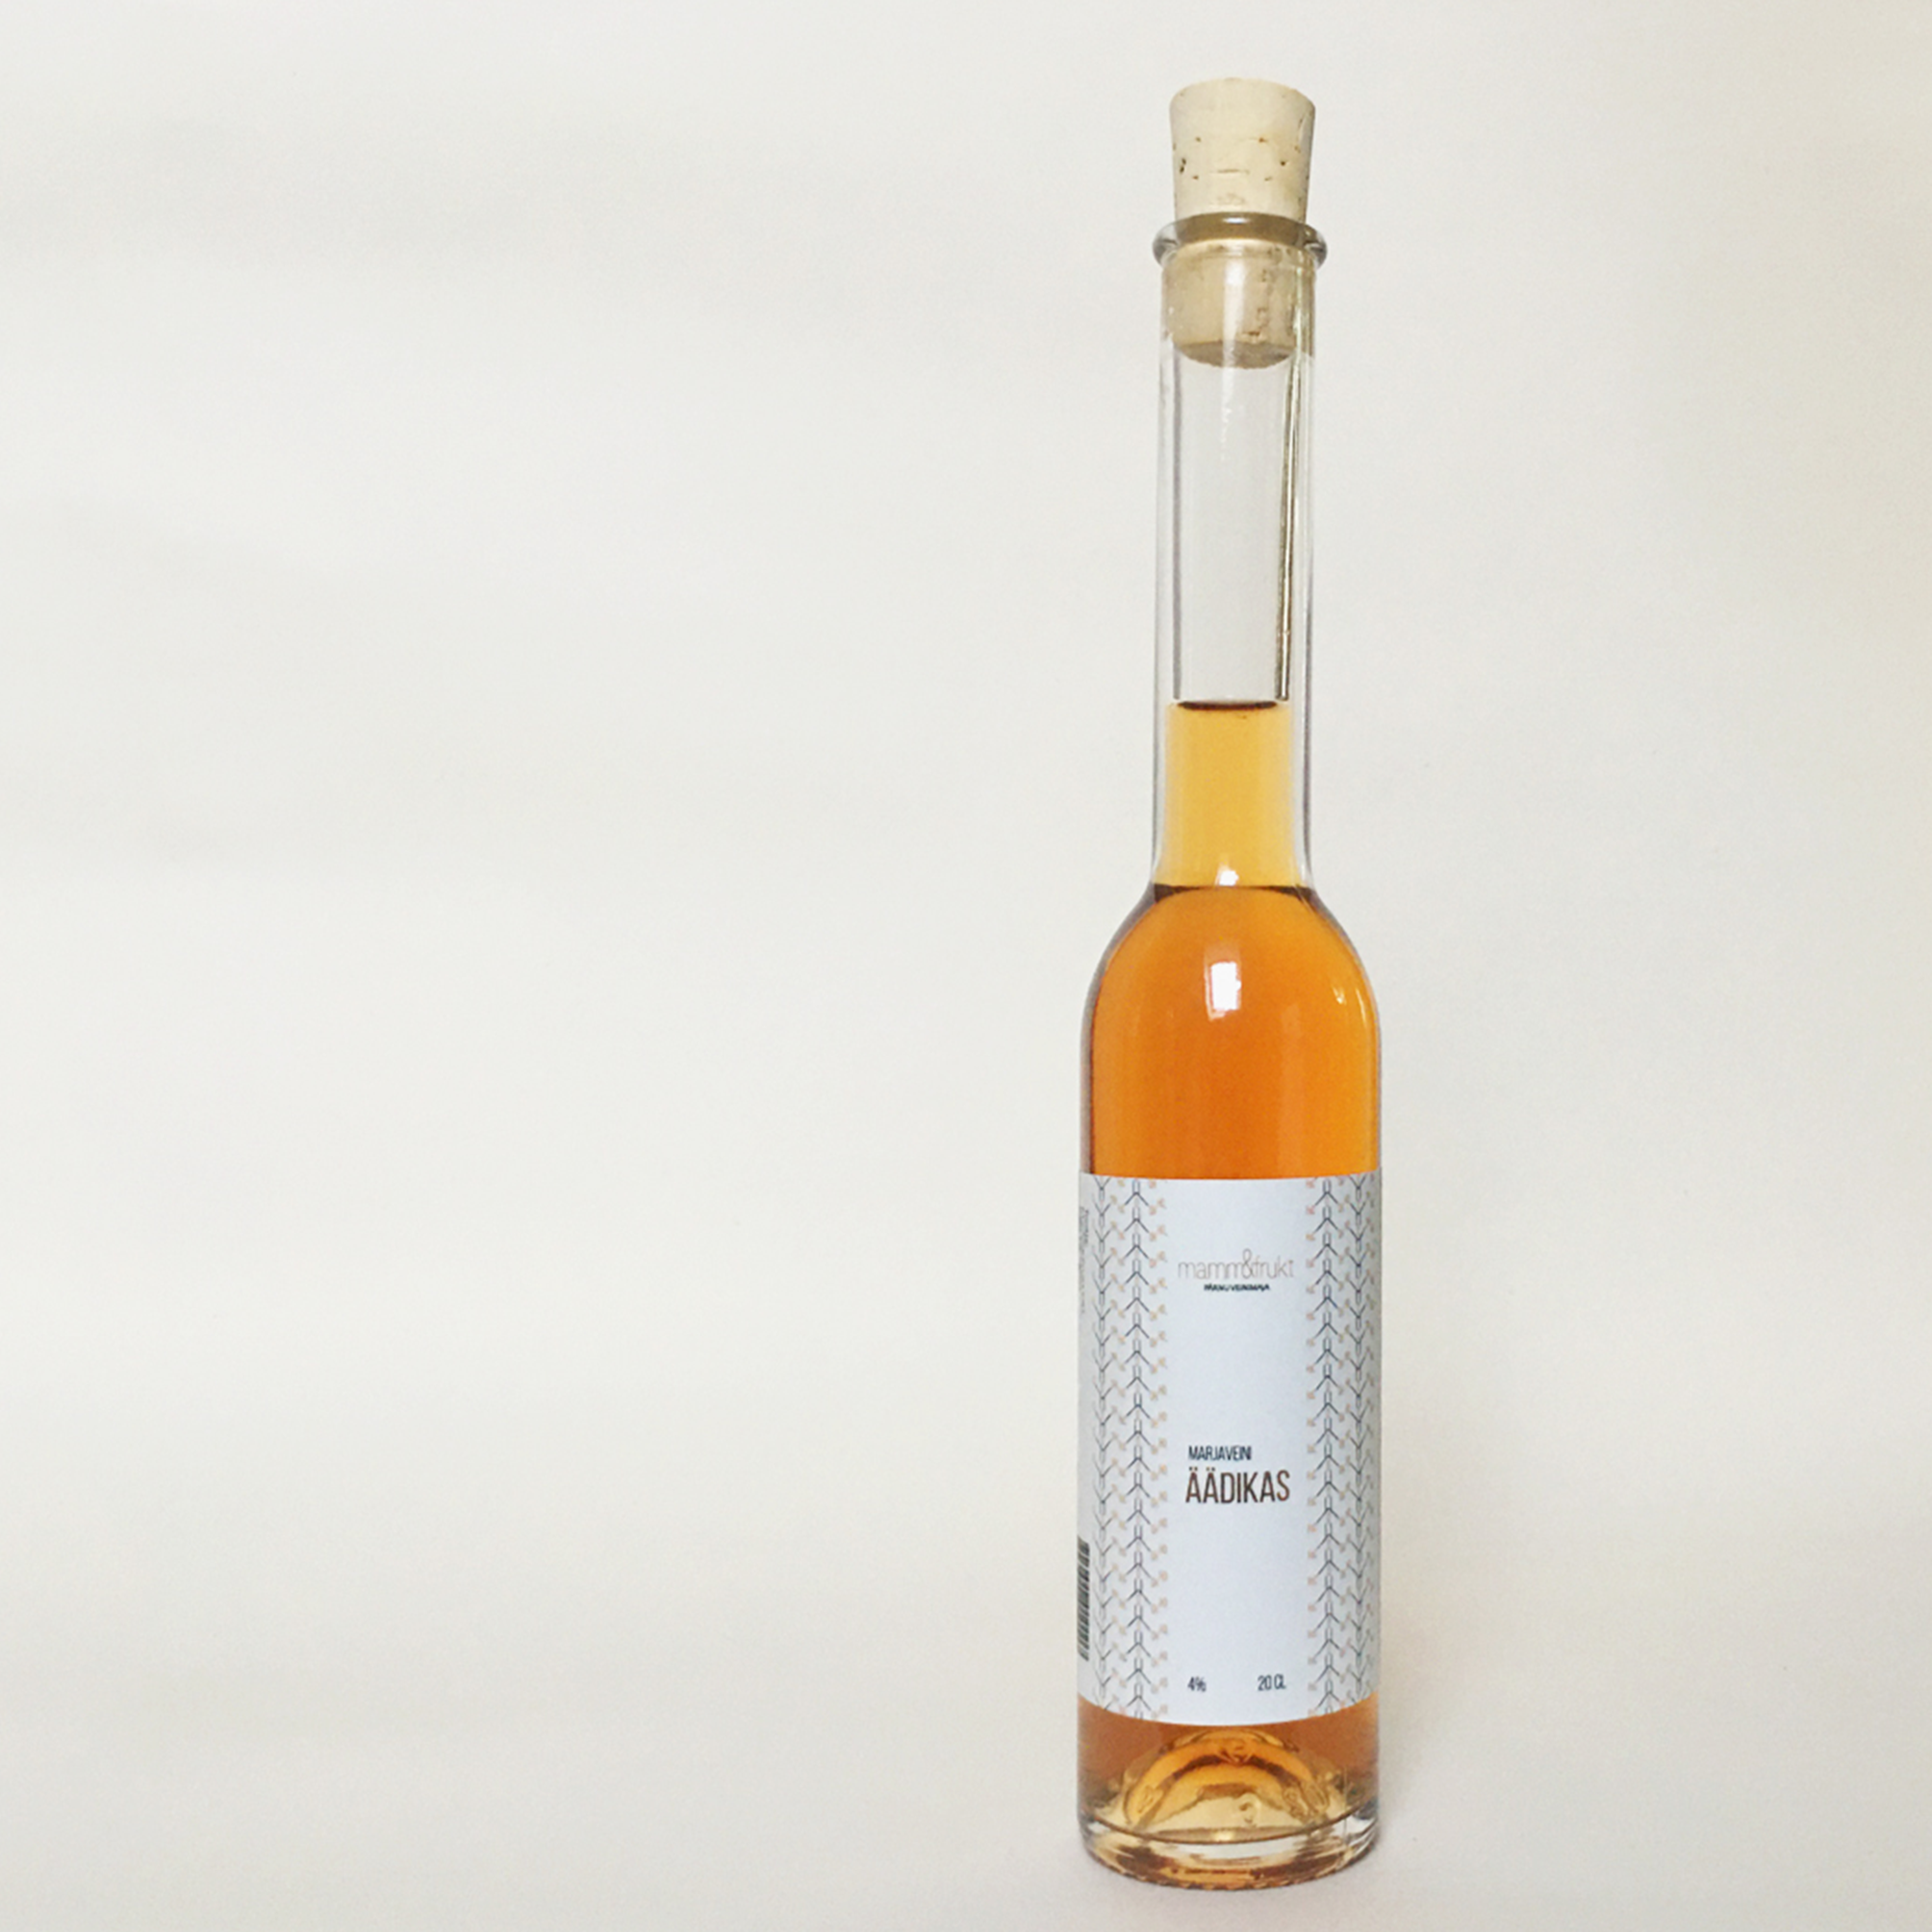 Mamm&Frukt pärnu veinimaja valge veiniäädikas